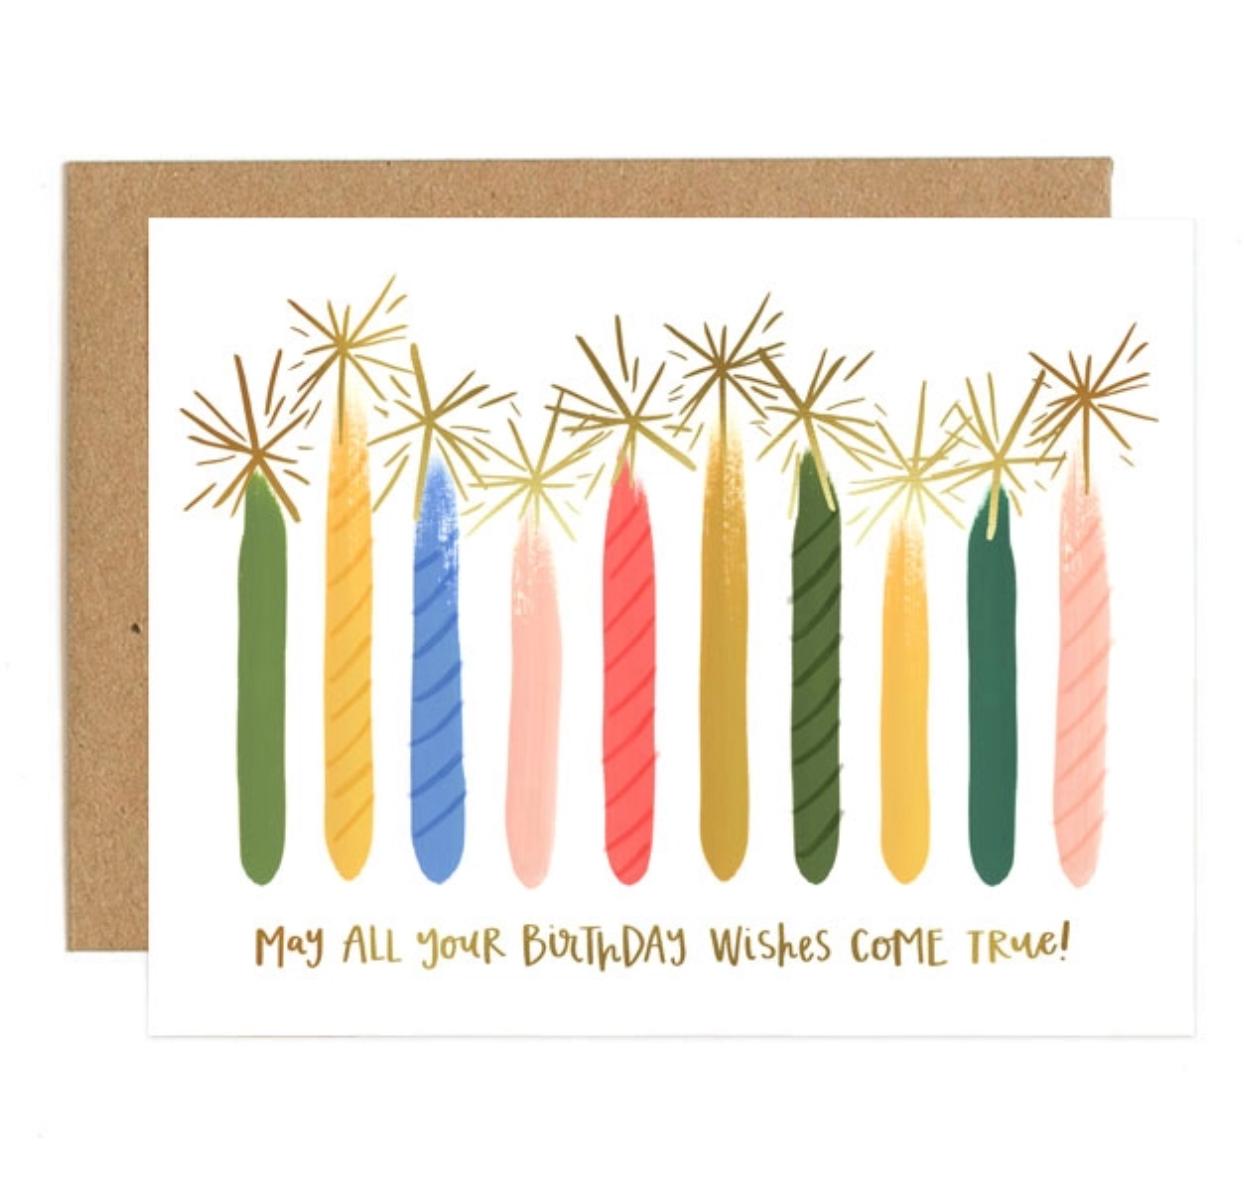 1canoe2 Candle Birthday Greeting Card